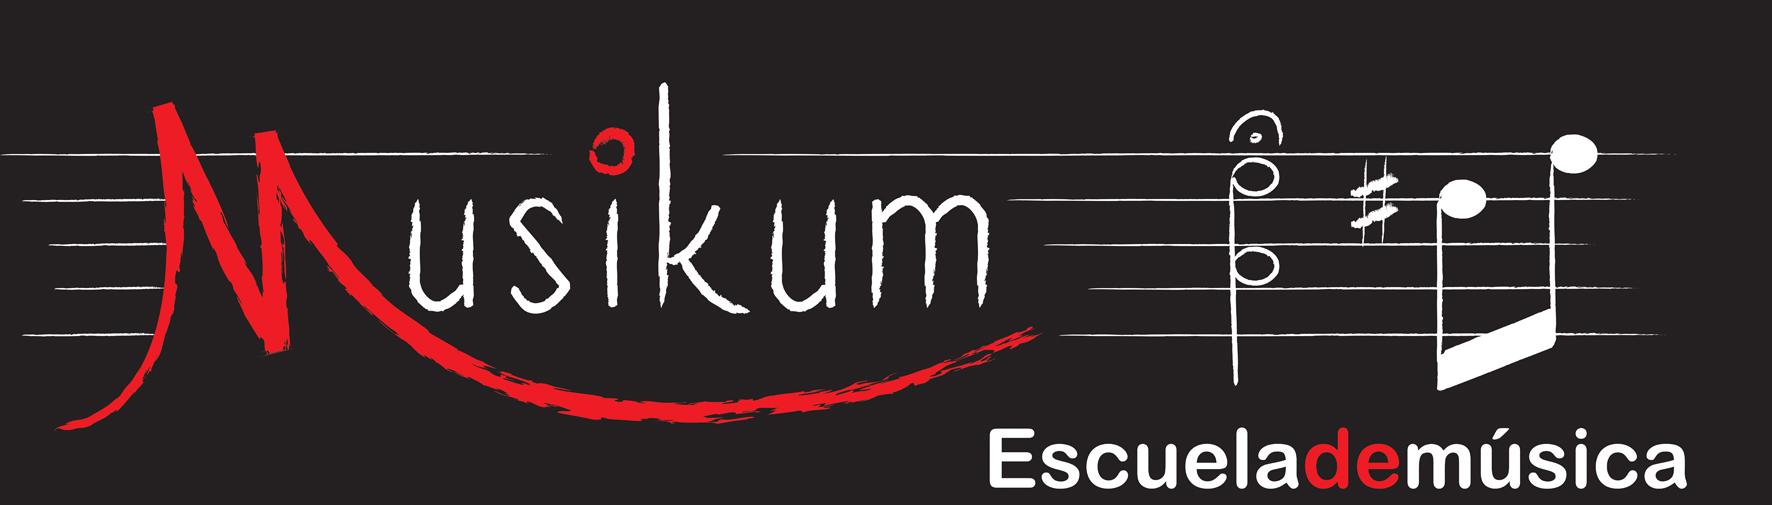 MUSIKUM sobre negro 1 pq Musikum, escuela de musica